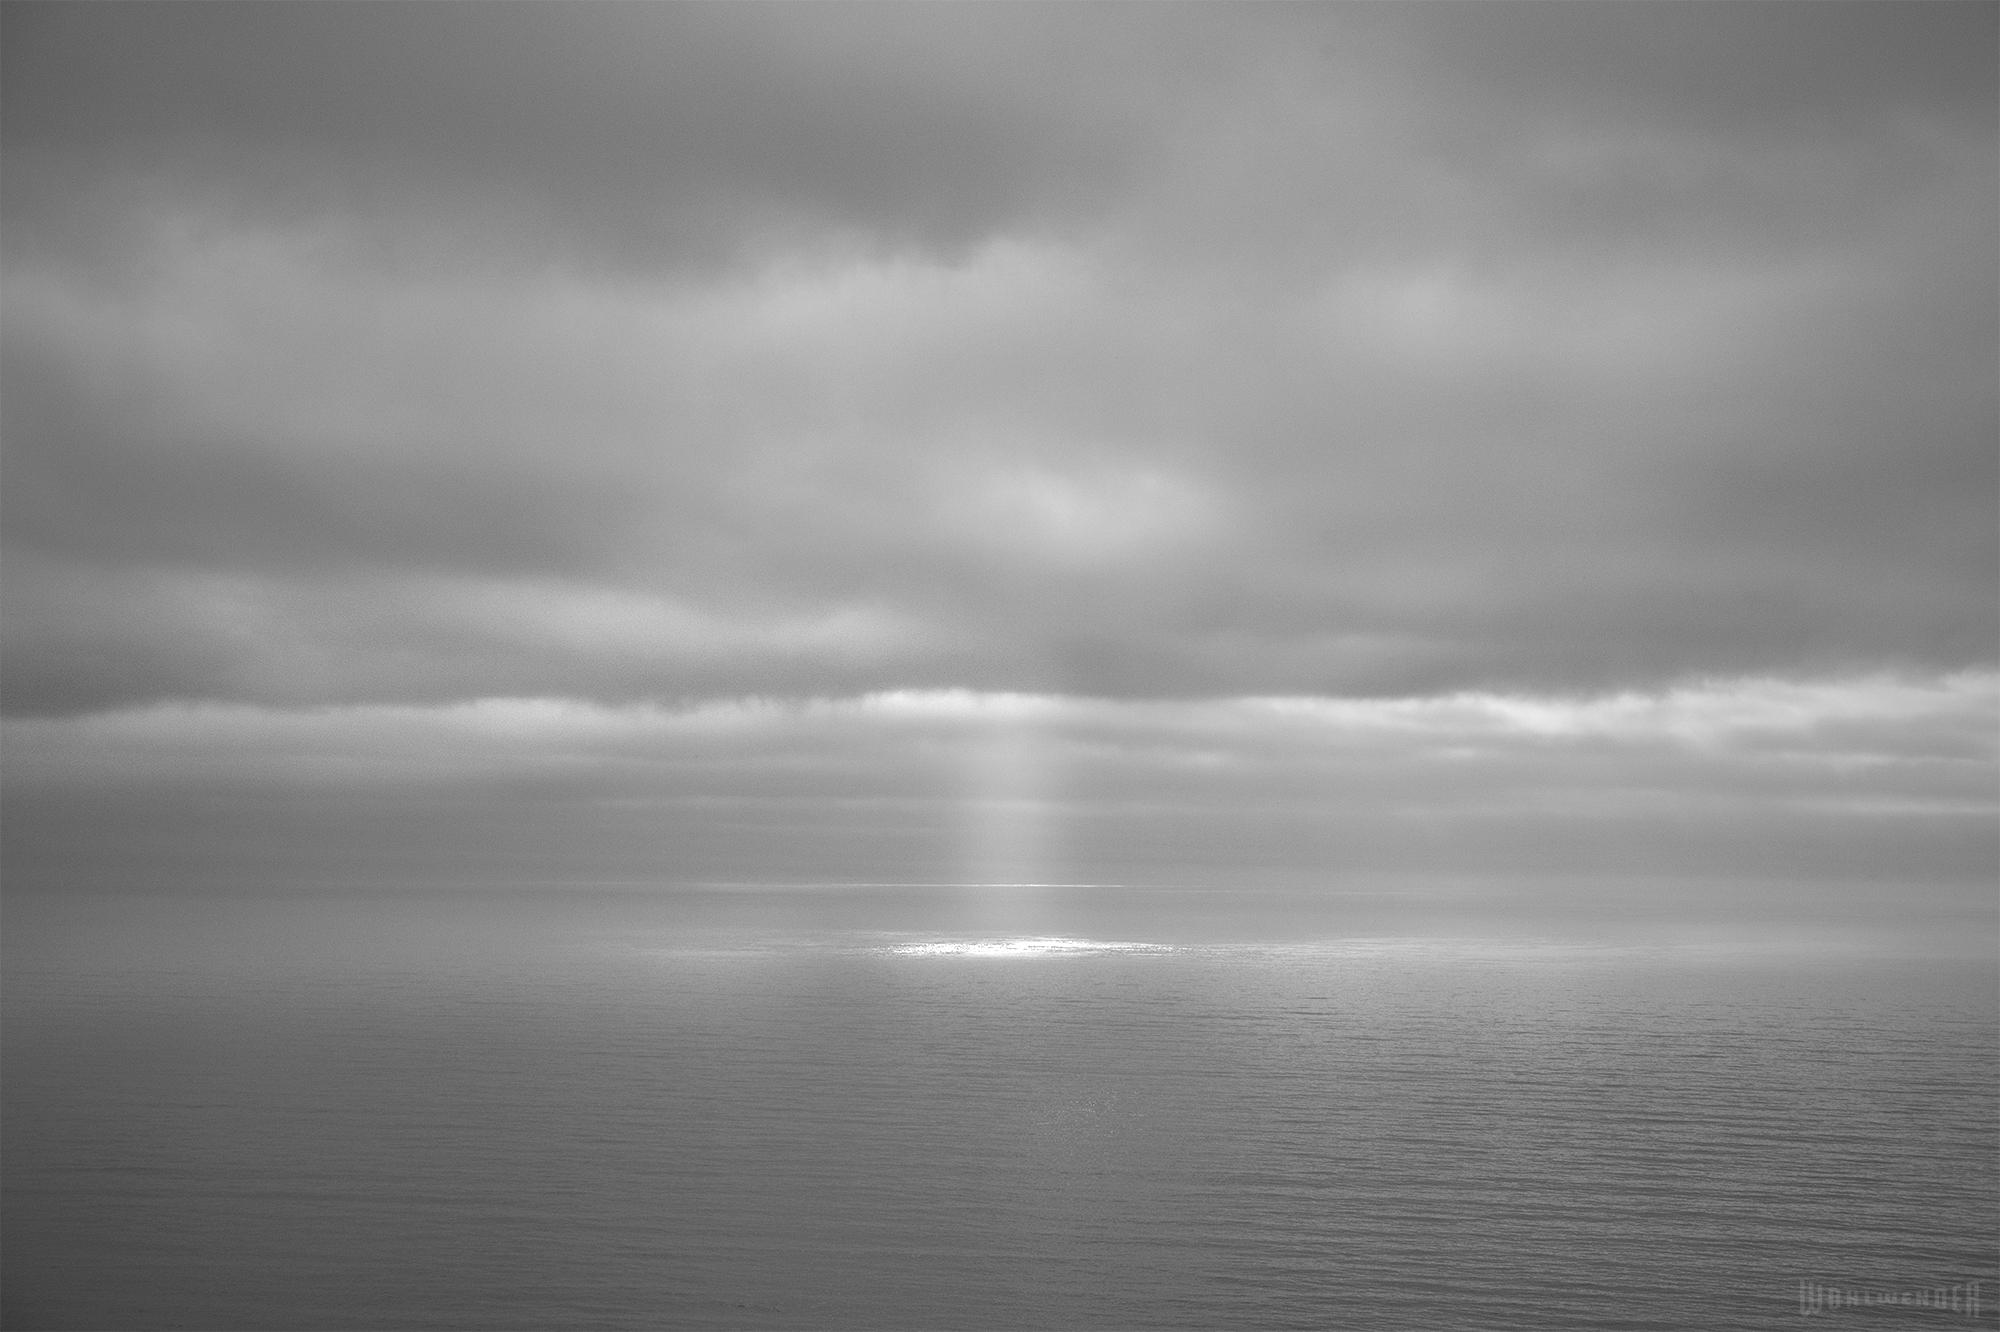 Steven Wohlwender, Photographer, Director, California USA